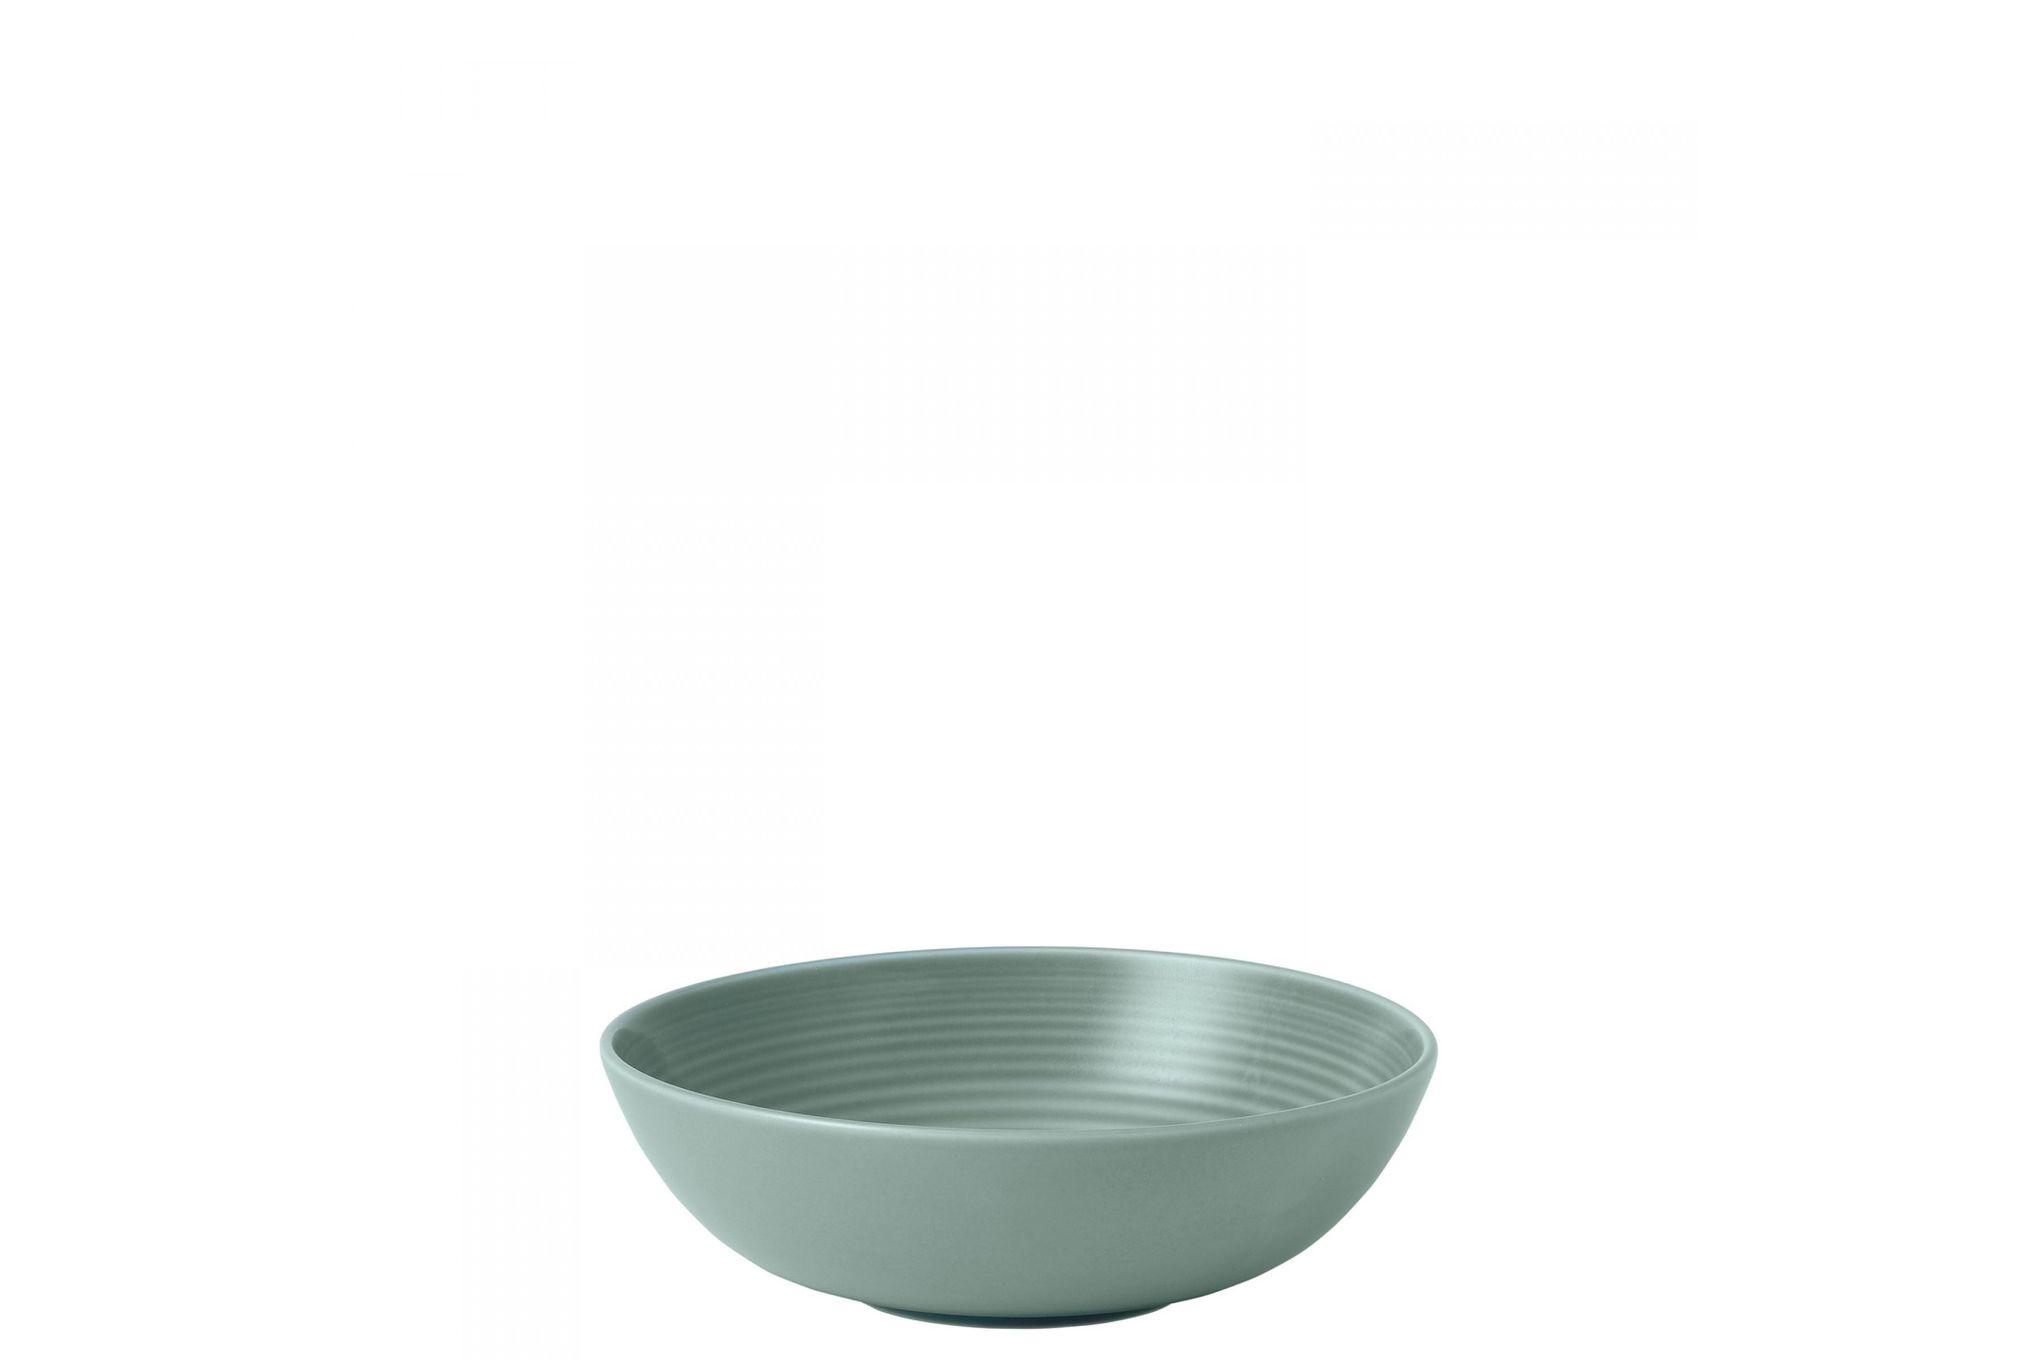 Gordon Ramsay for Royal Doulton Maze Teal Cereal Bowl 18cm thumb 1